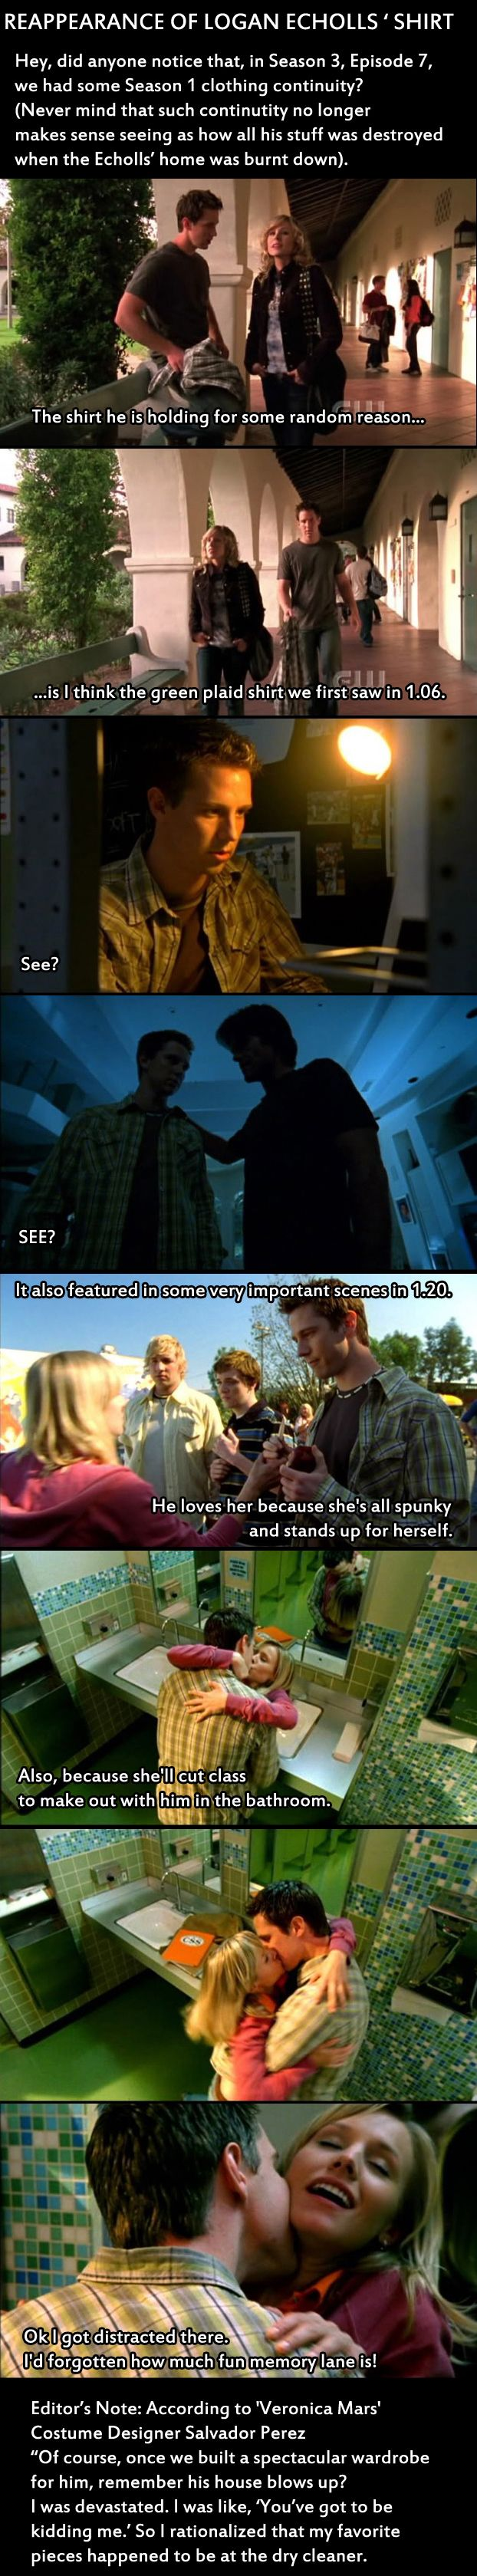 "A cameo in Season 3 of ""Veronica Mars"" by ....Logan's shirt!"